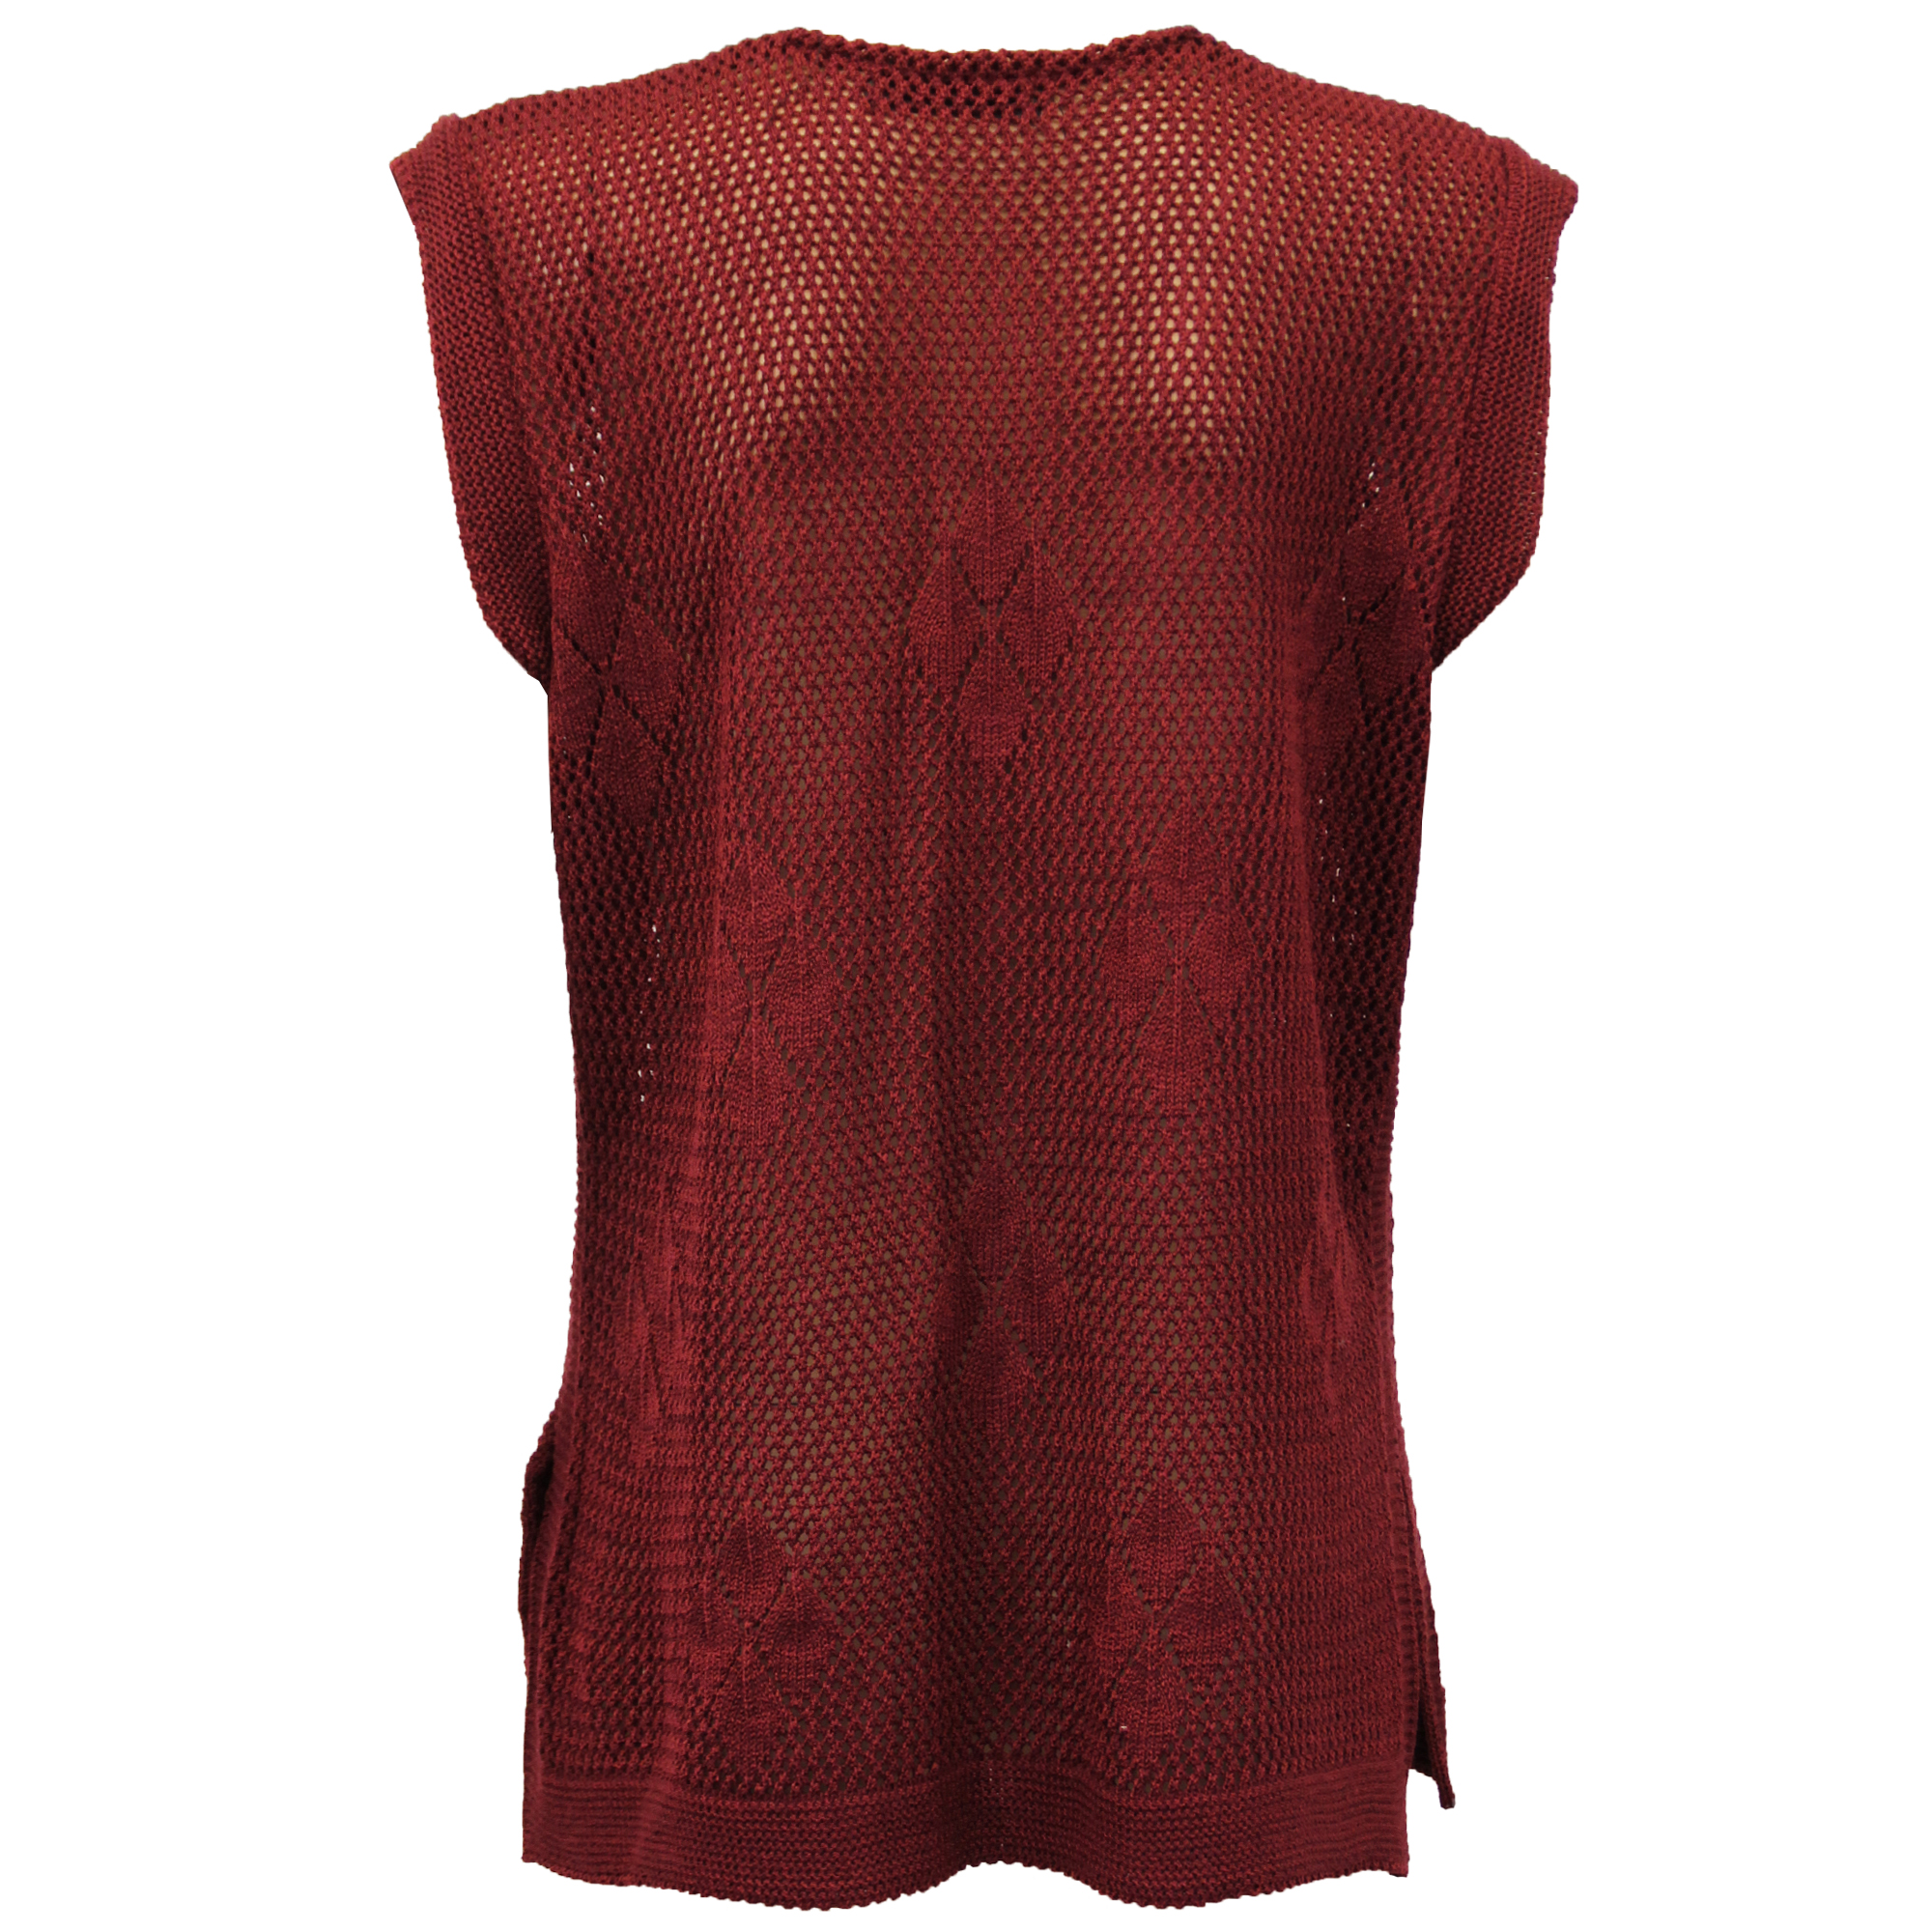 Knitting Pattern Womens Gilet : Ladies Cardigans Womens Gilet Knitted Crochet Waistcoat Sleeveless Casual Win...